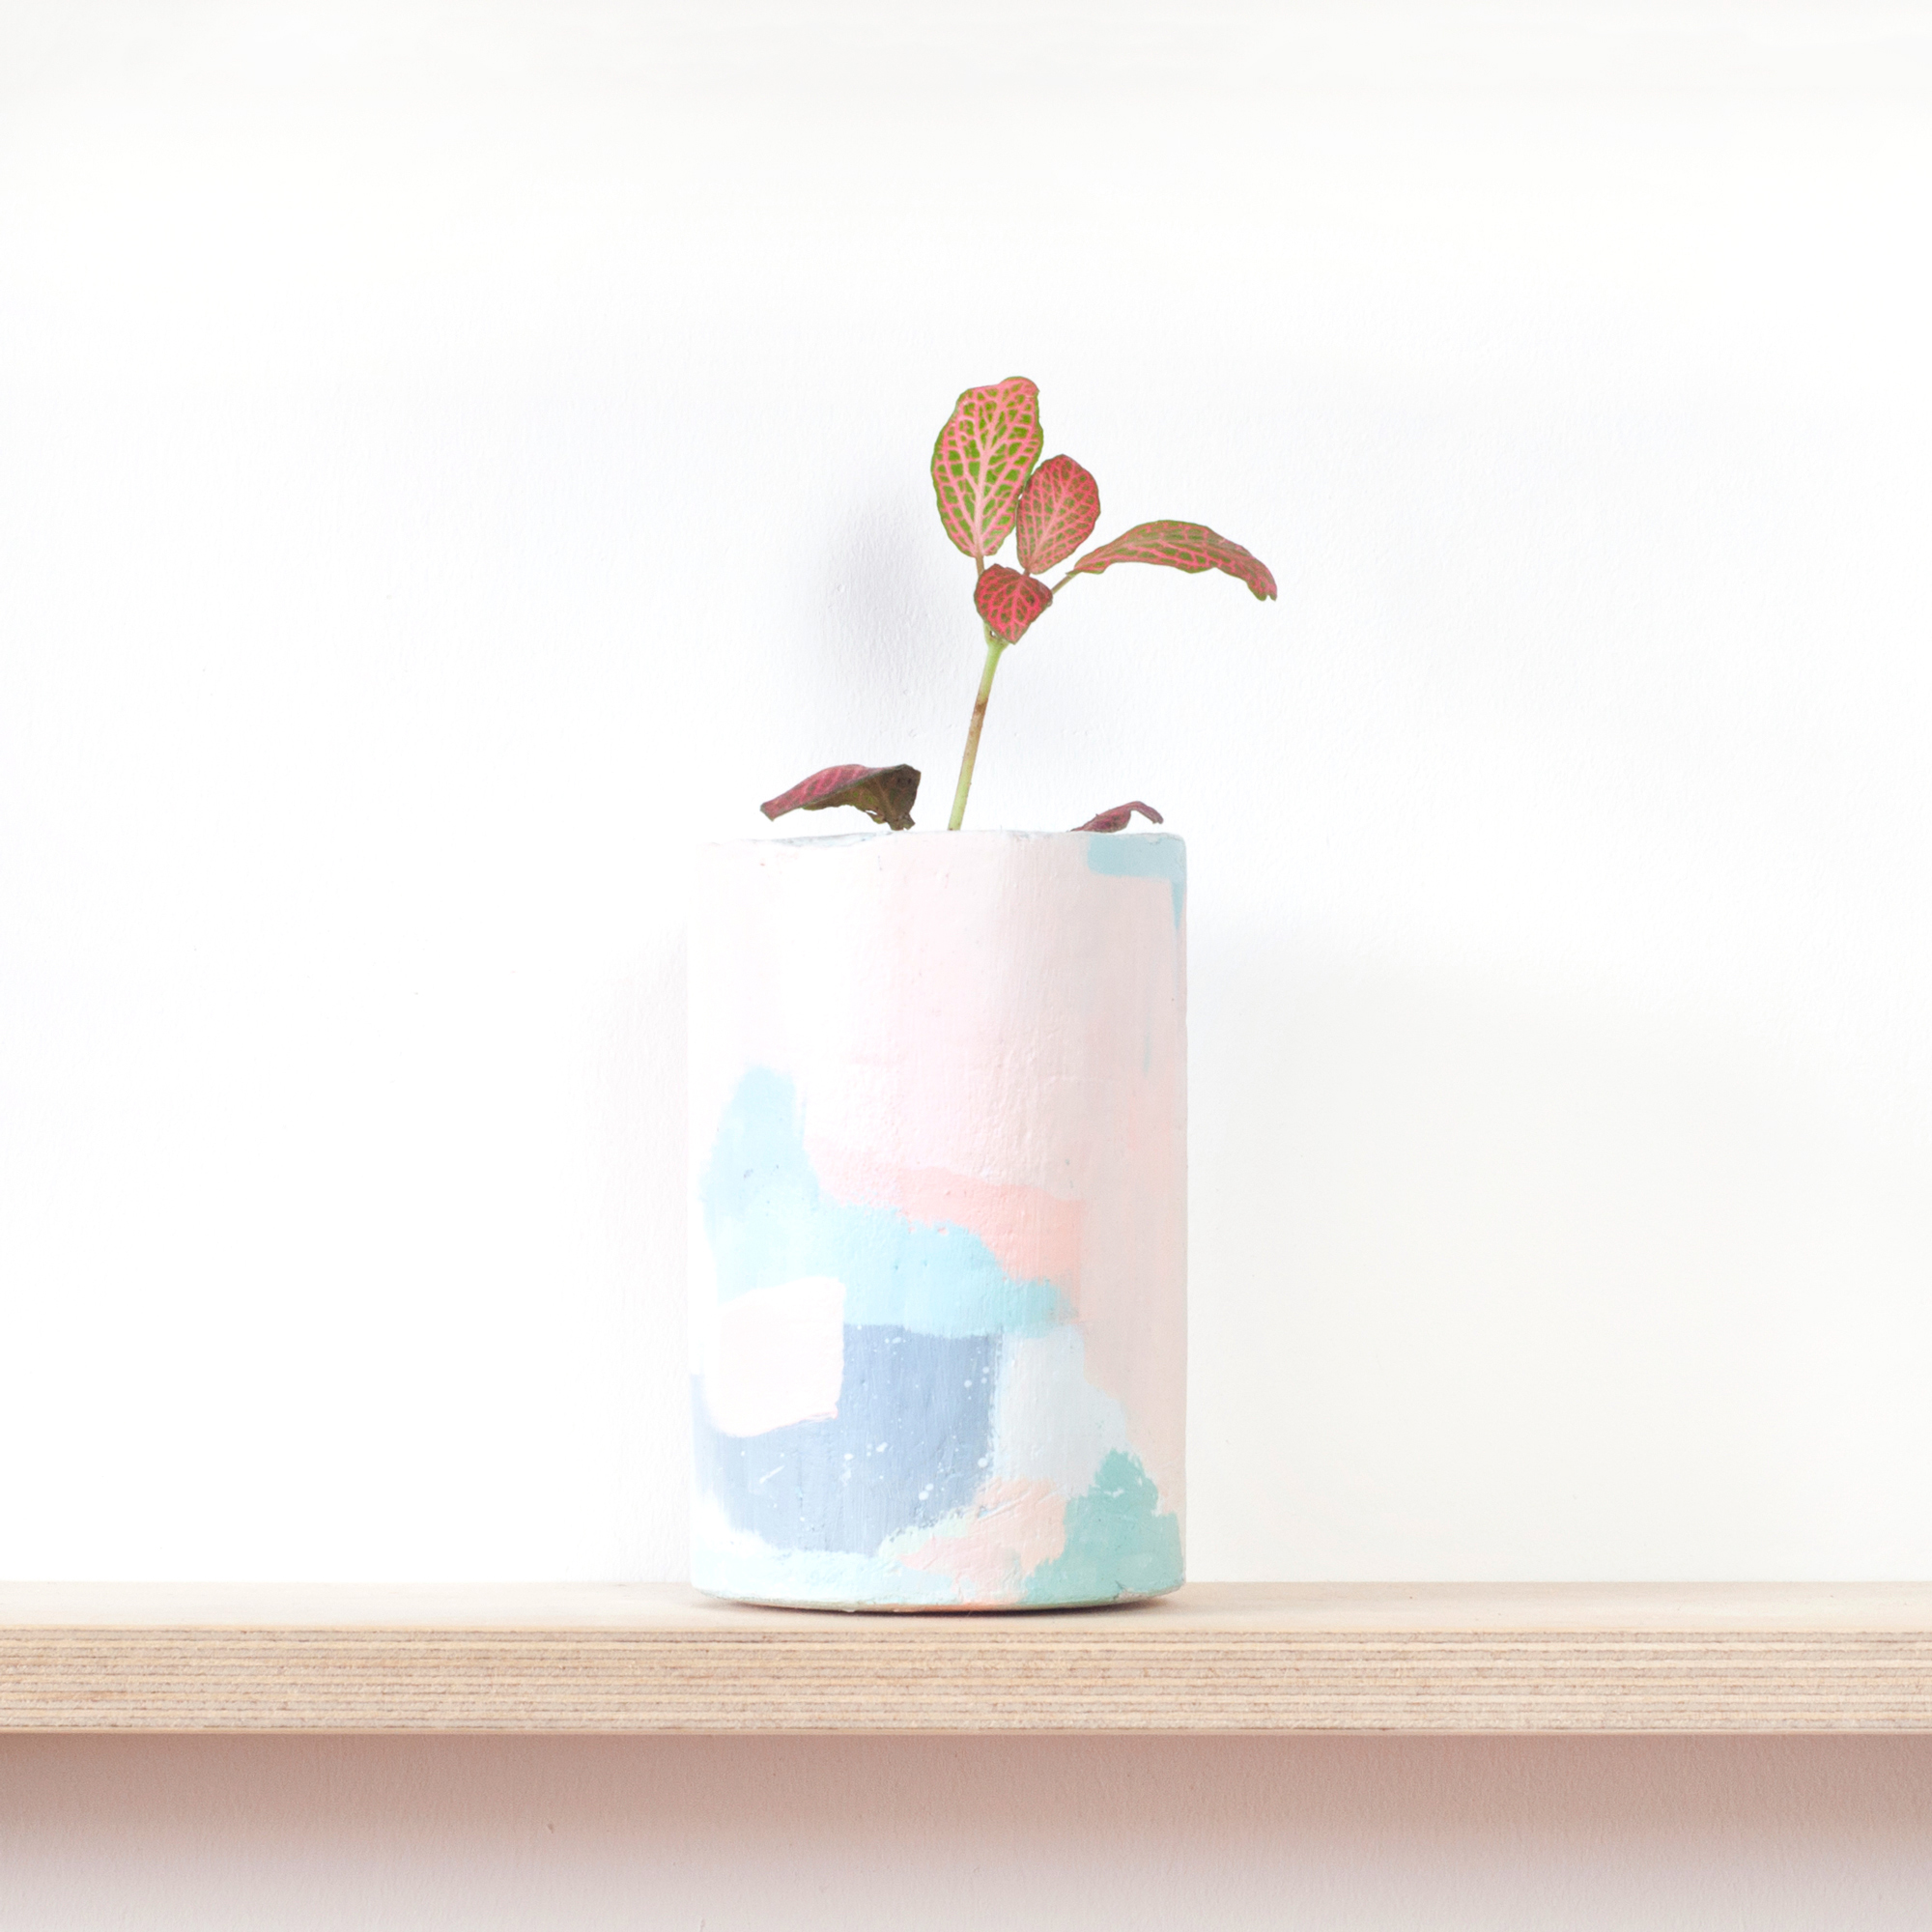 12-plantpot-lauragee-web.jpg